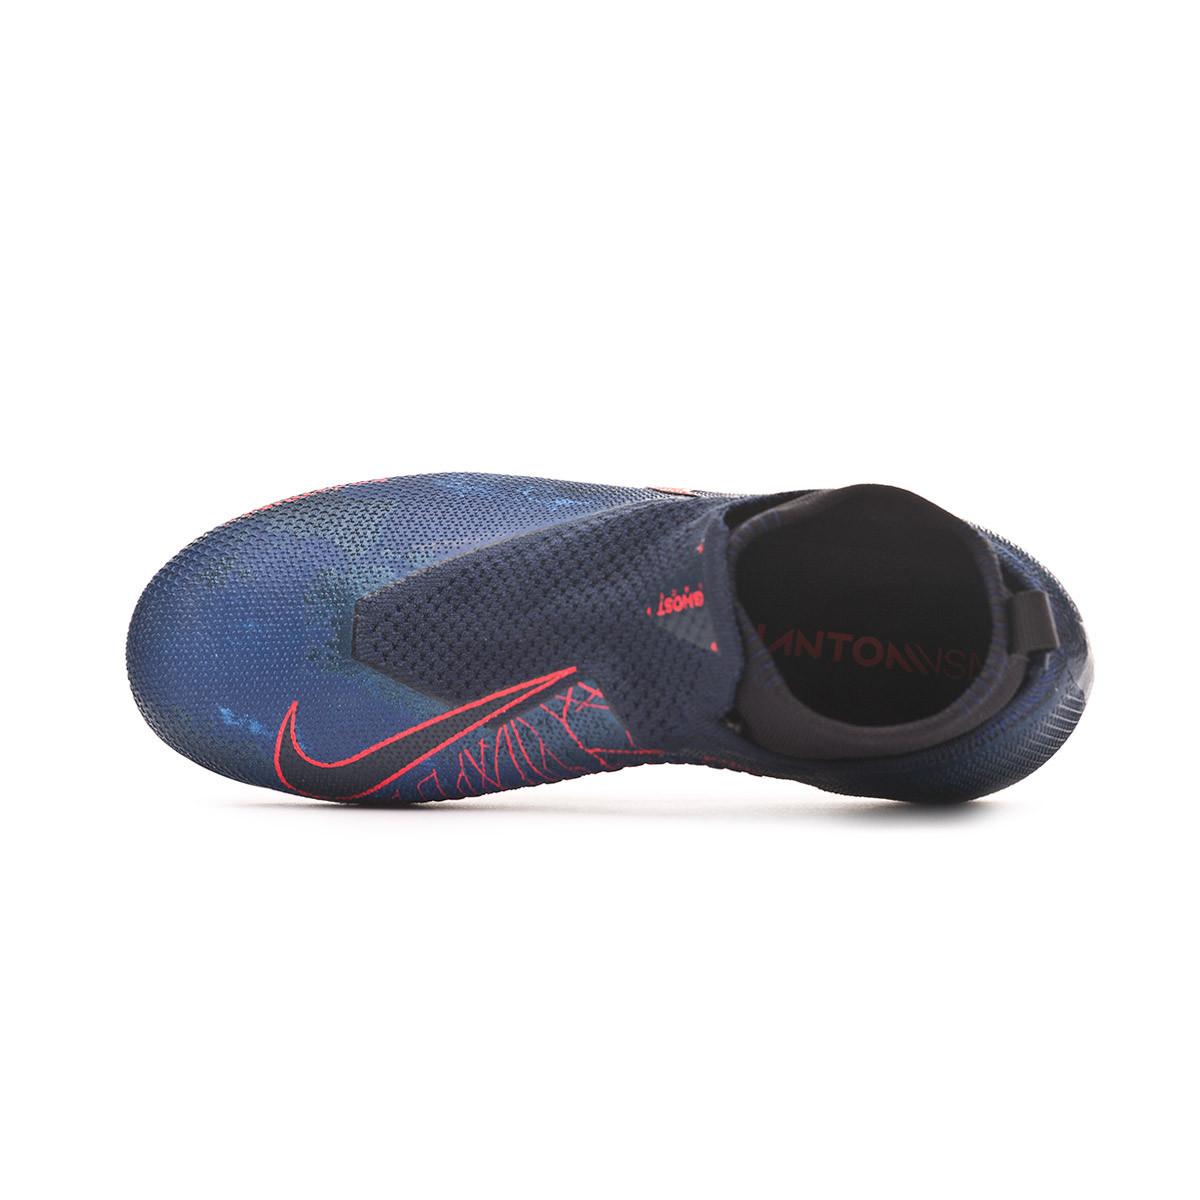 890cf2cdd Football Boots Nike Phantom Vision Elite DF FG MG Niño Obsidian-Black-Blue  void - Tienda de fútbol Fútbol Emotion